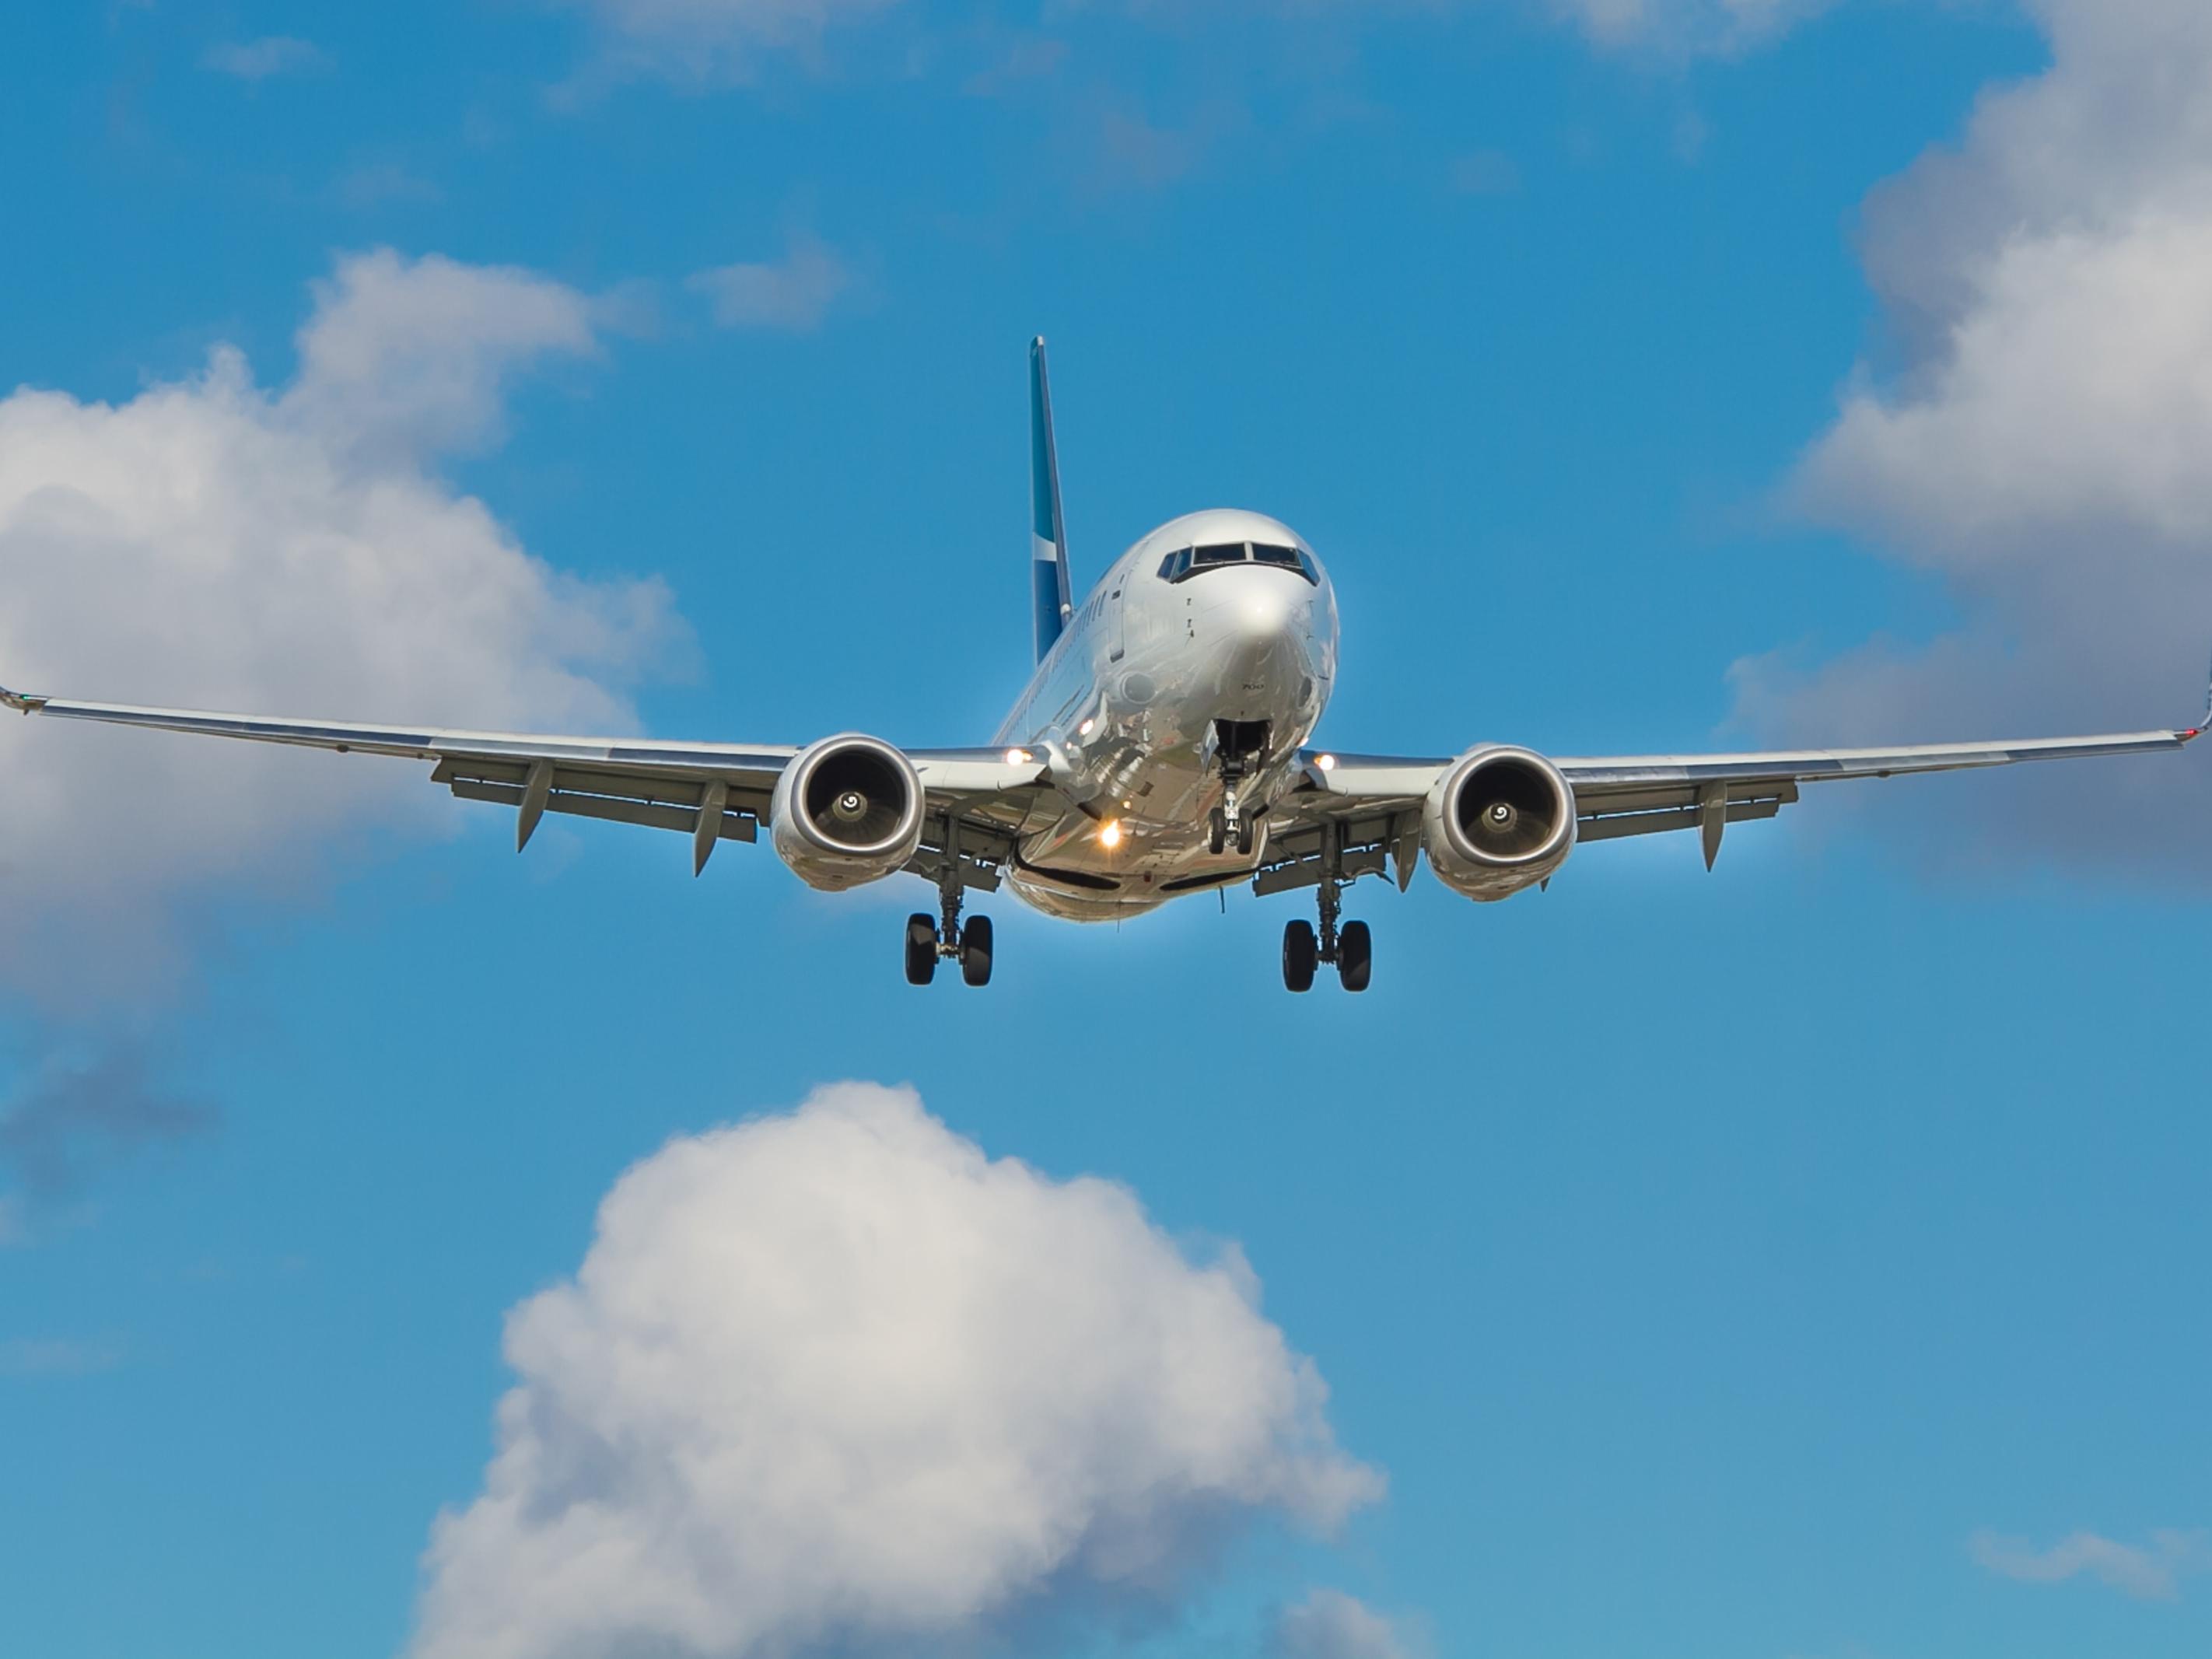 BARIN - Webinar Cleared for Take-off, a safe restart of travel!